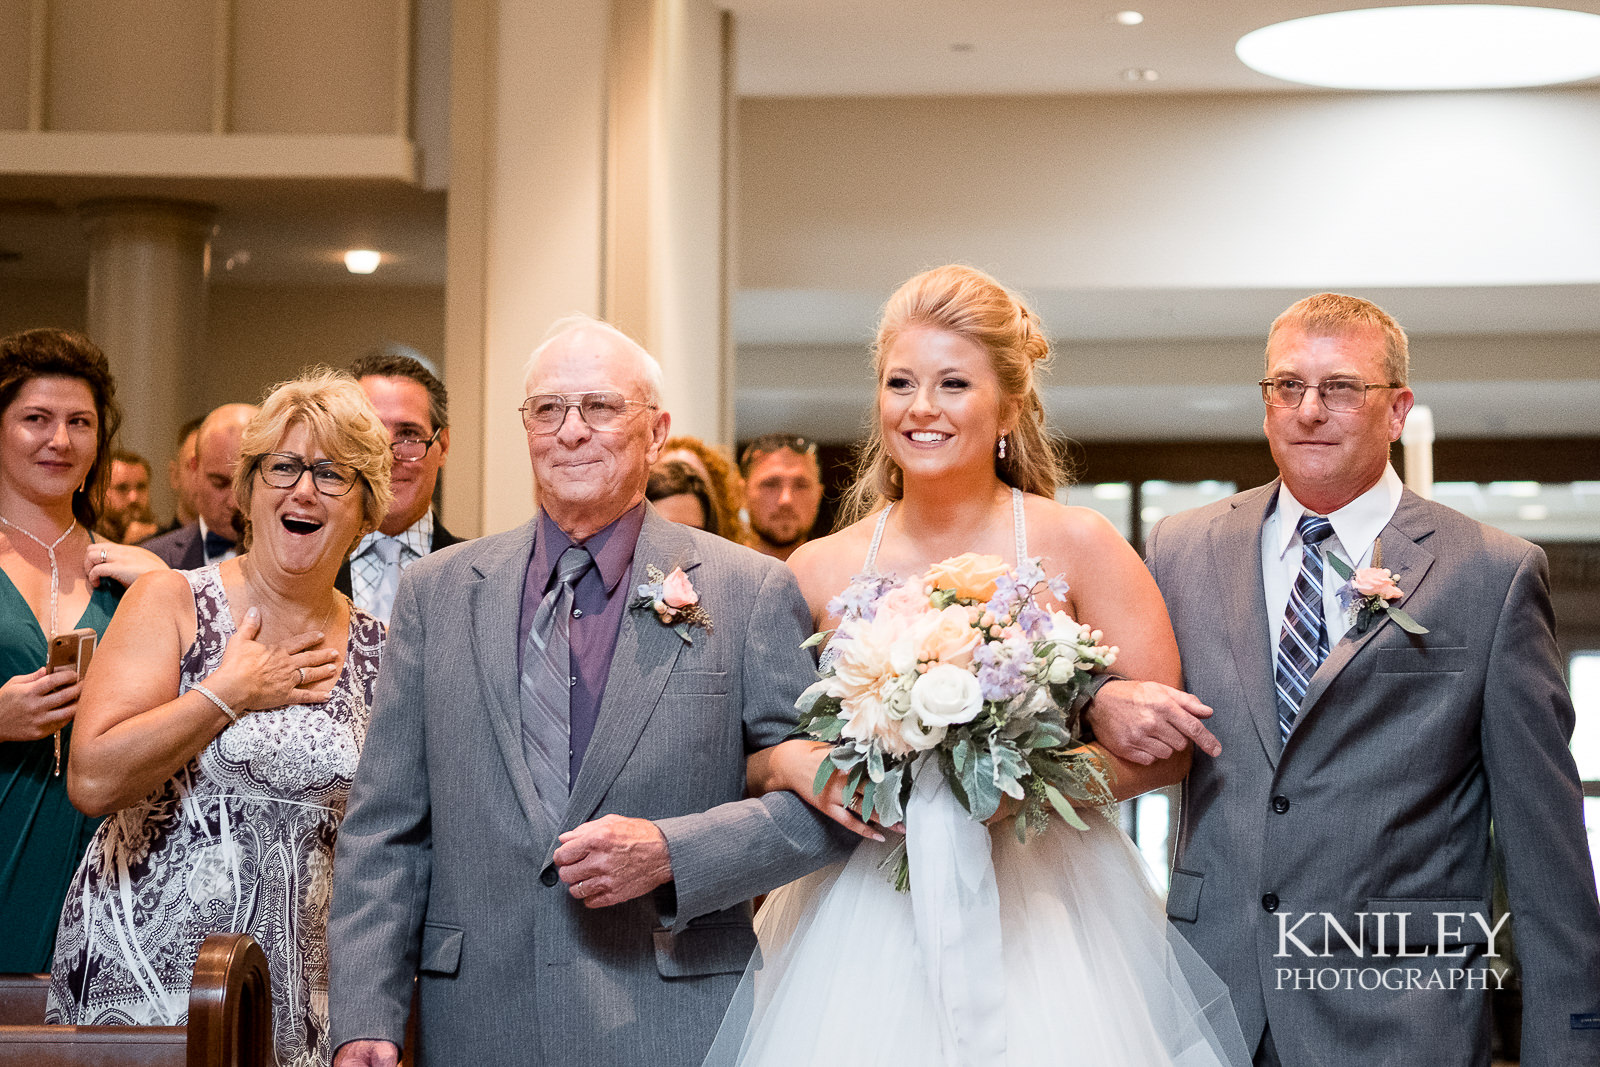 049 - Buffalo NY wedding pictures - St Marys Church - XT2B8606.jpg